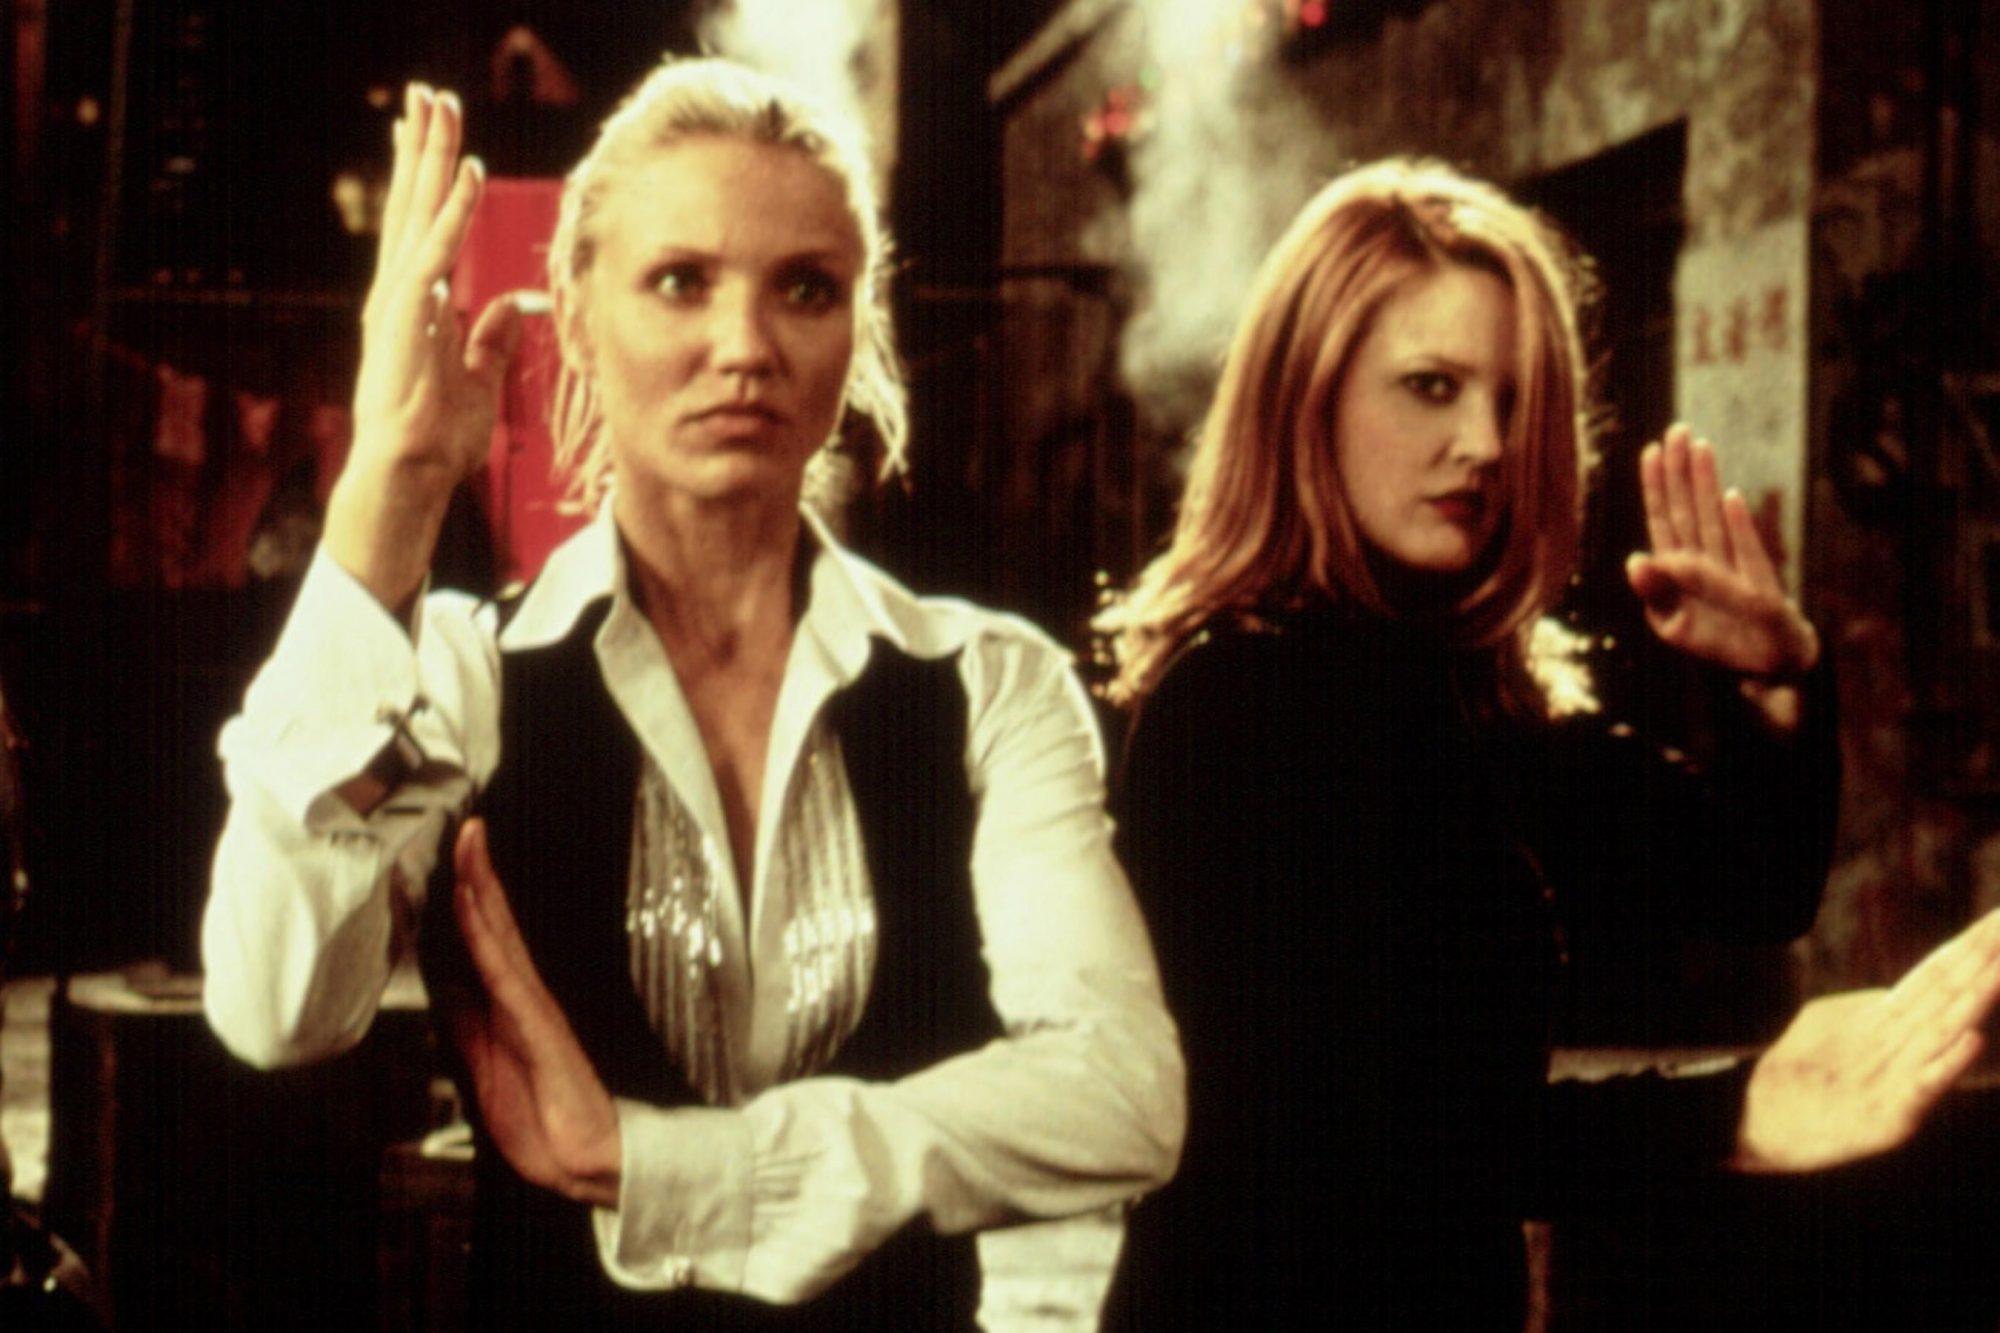 CHARLIE'S ANGELS, Lucy Liu, Cameron Diaz, Drew Barrymore, 2000